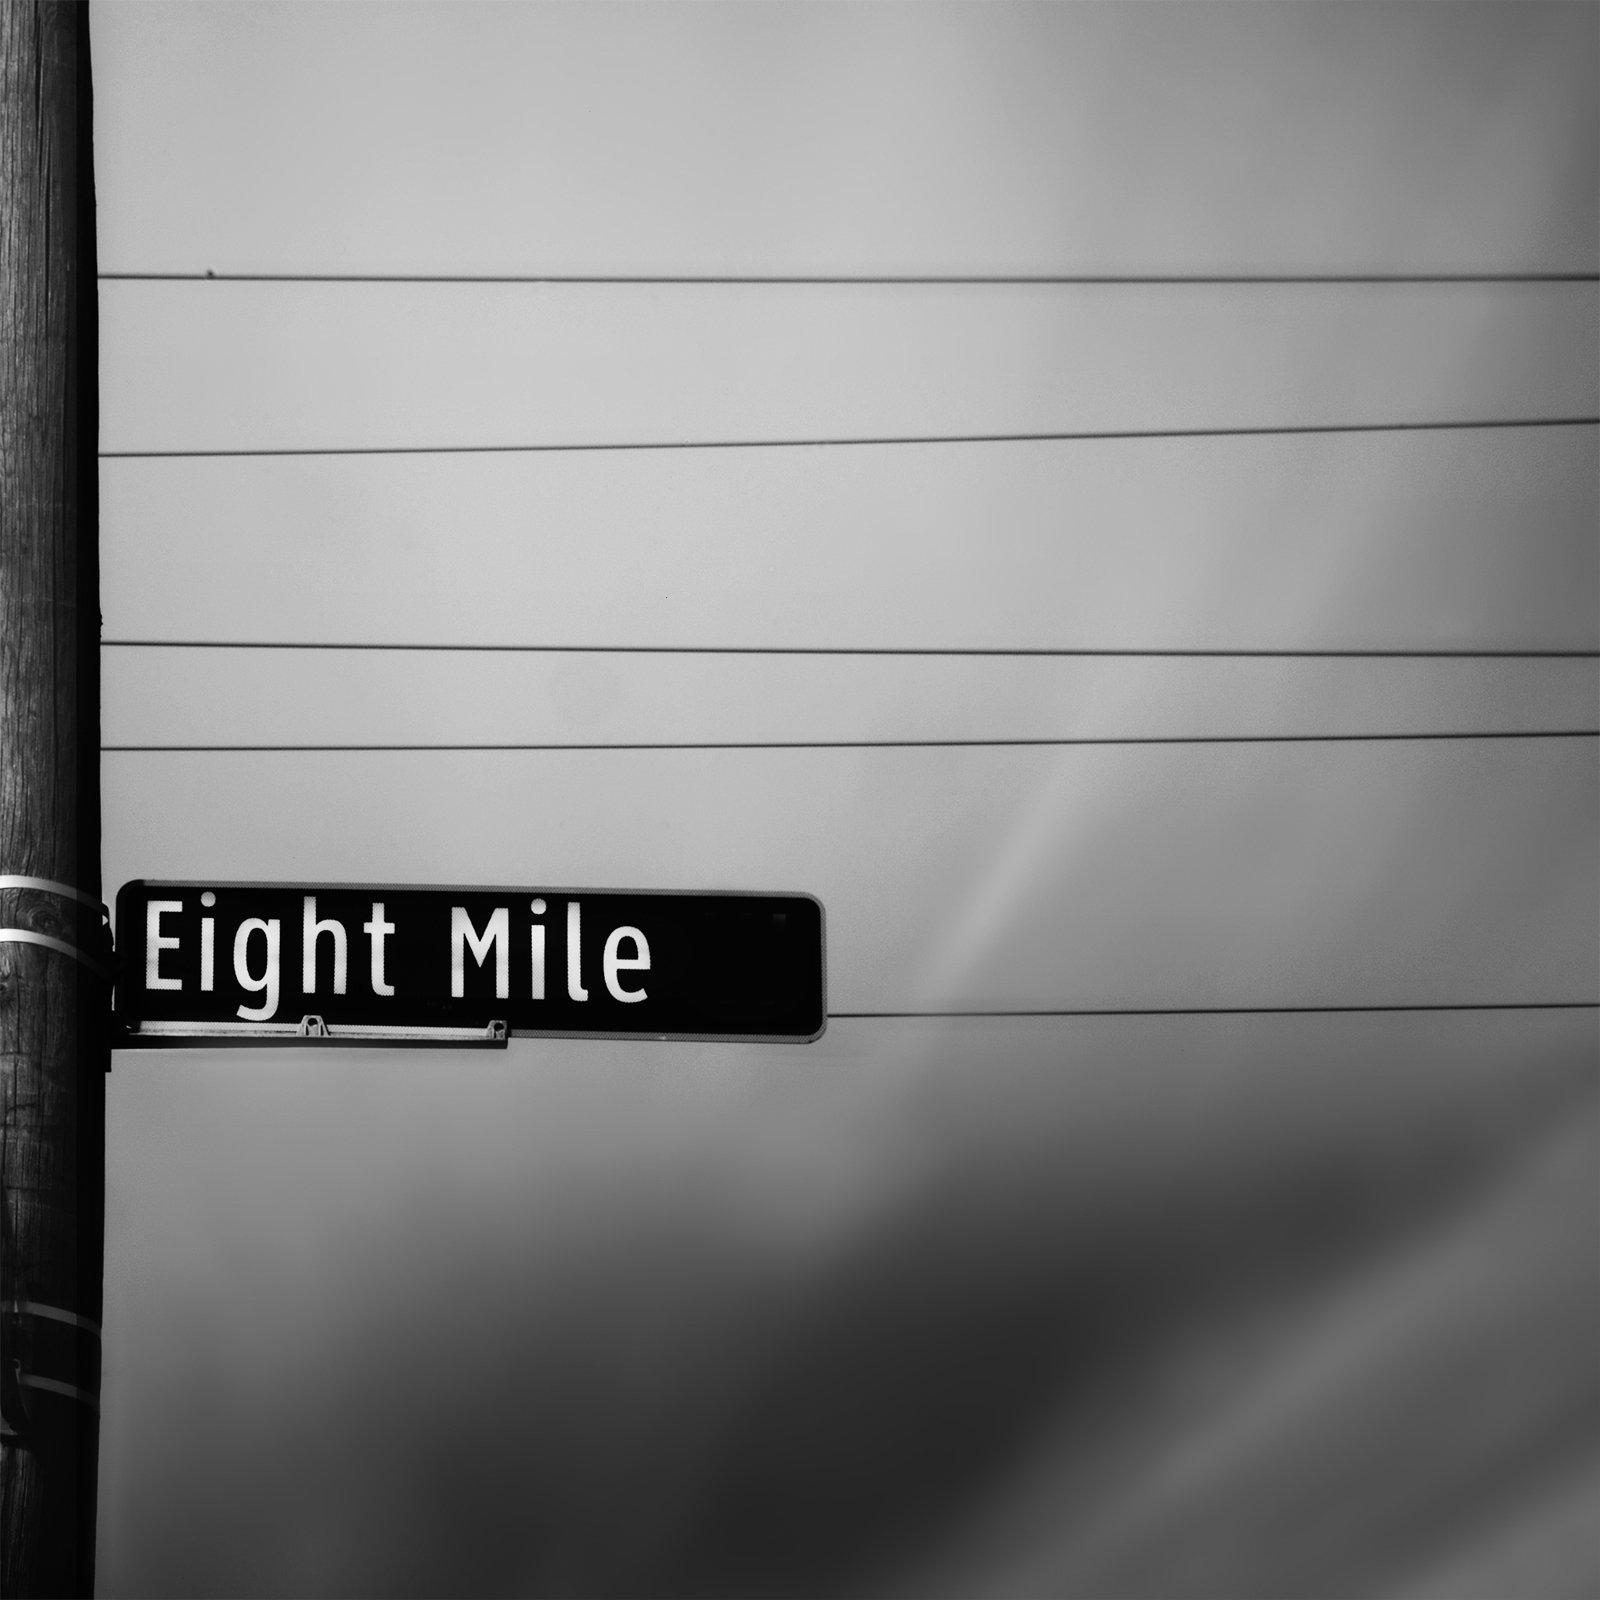 brian-day_eight-mile-sheet-music_1600.jpg